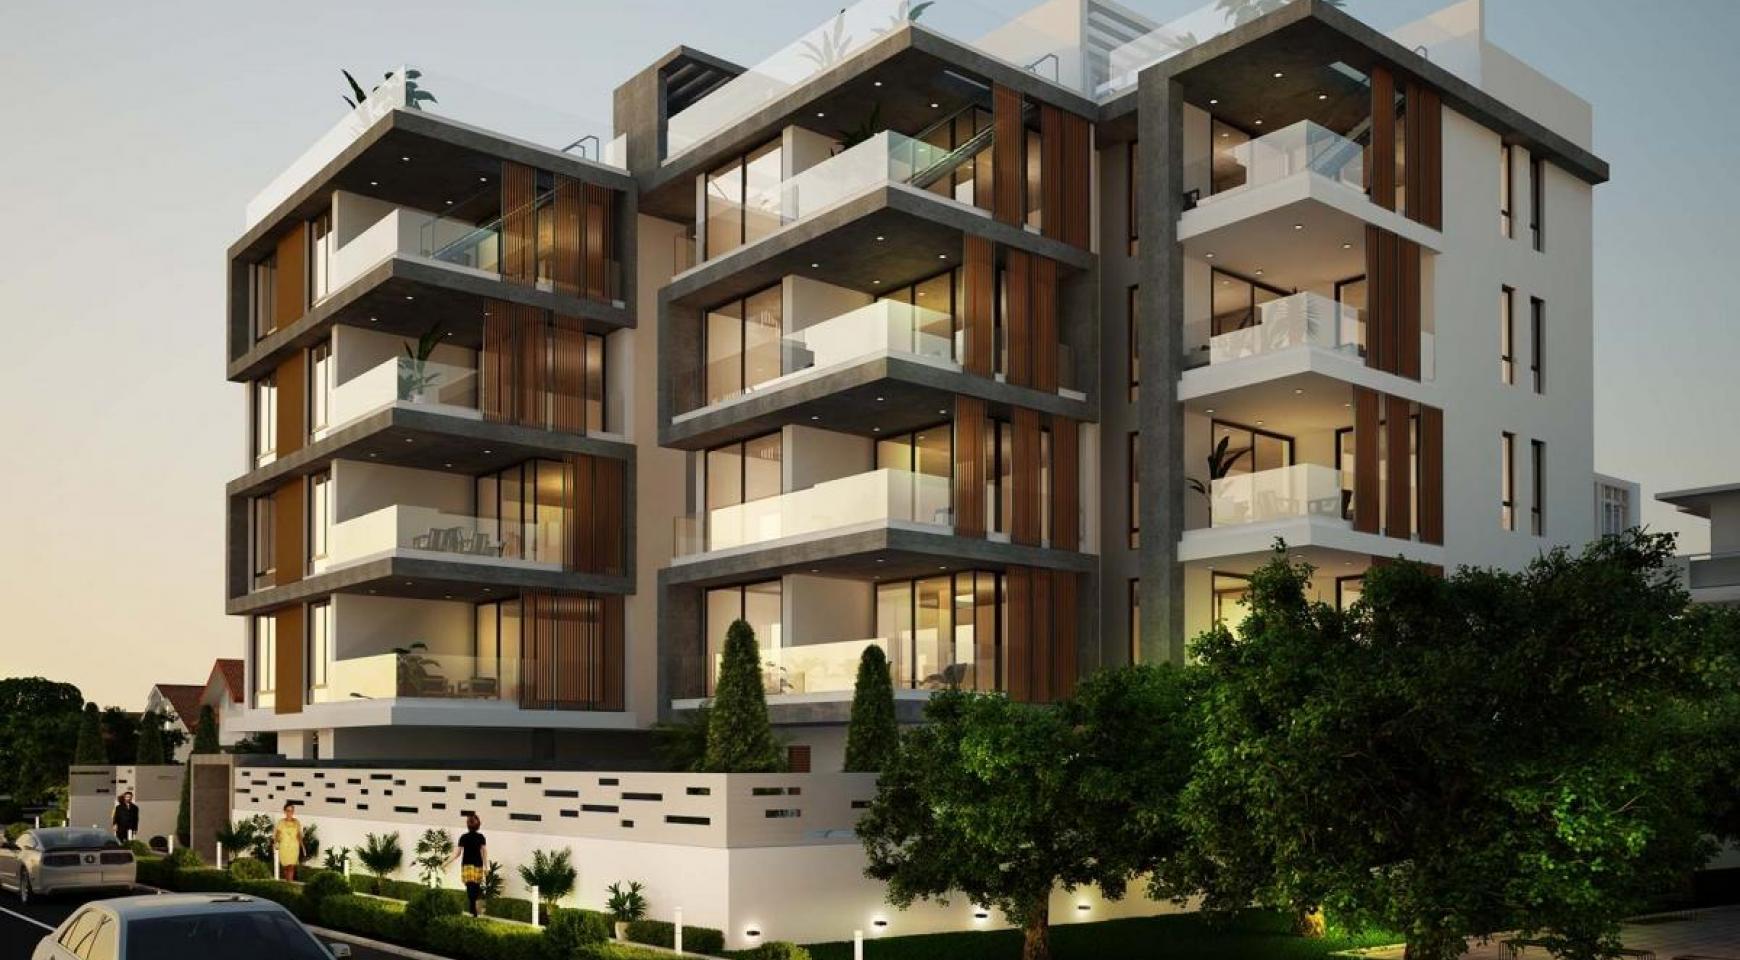 Contemporary 3 Bedroom Apartment in a New Complex near the Sea - 6